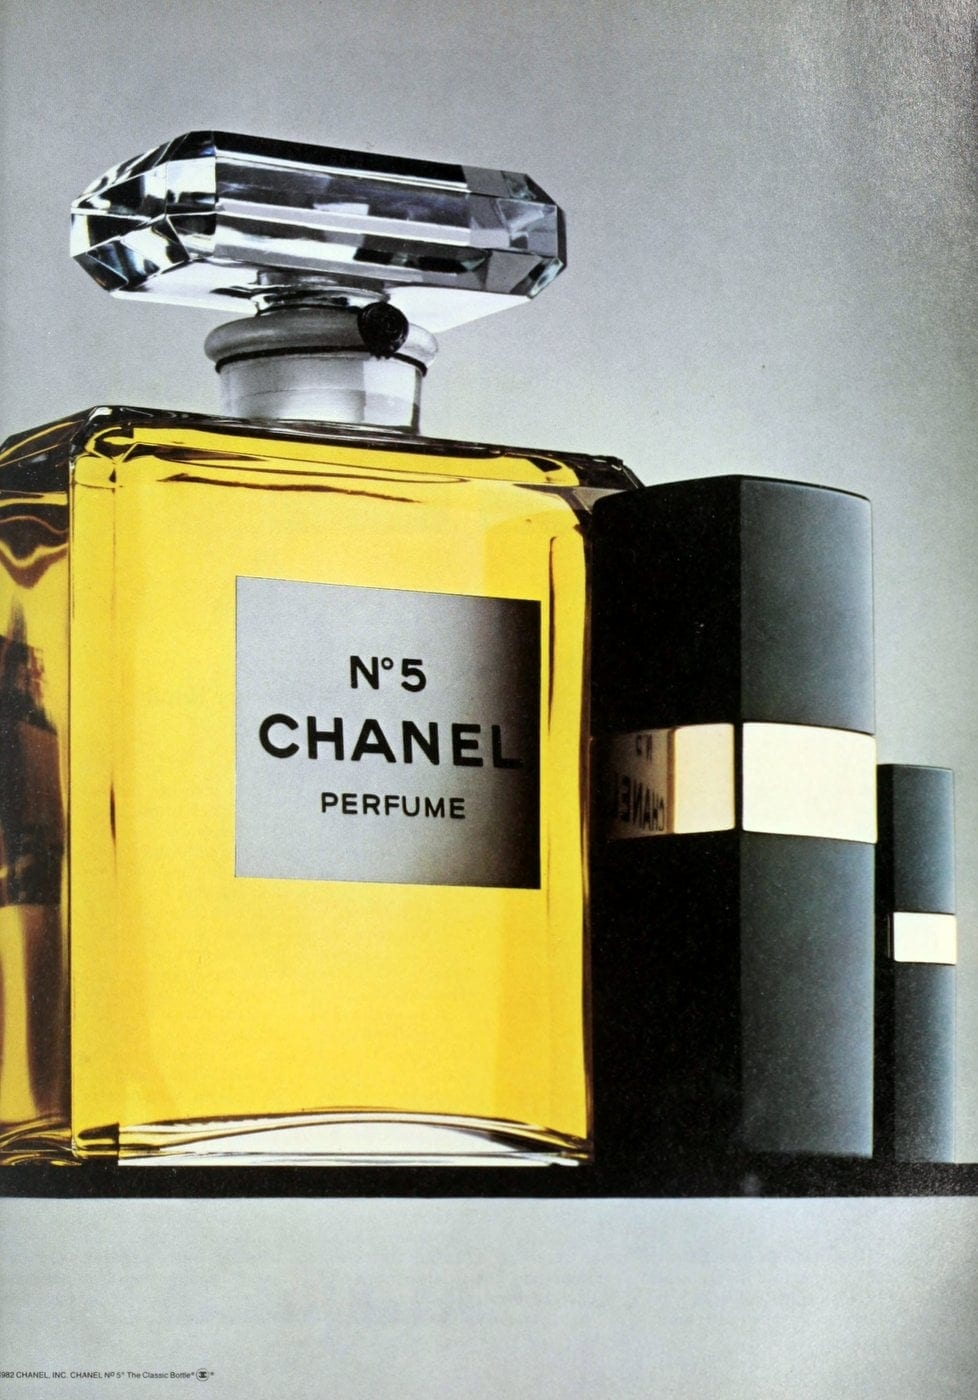 Chanel No 5 perfume - 1983